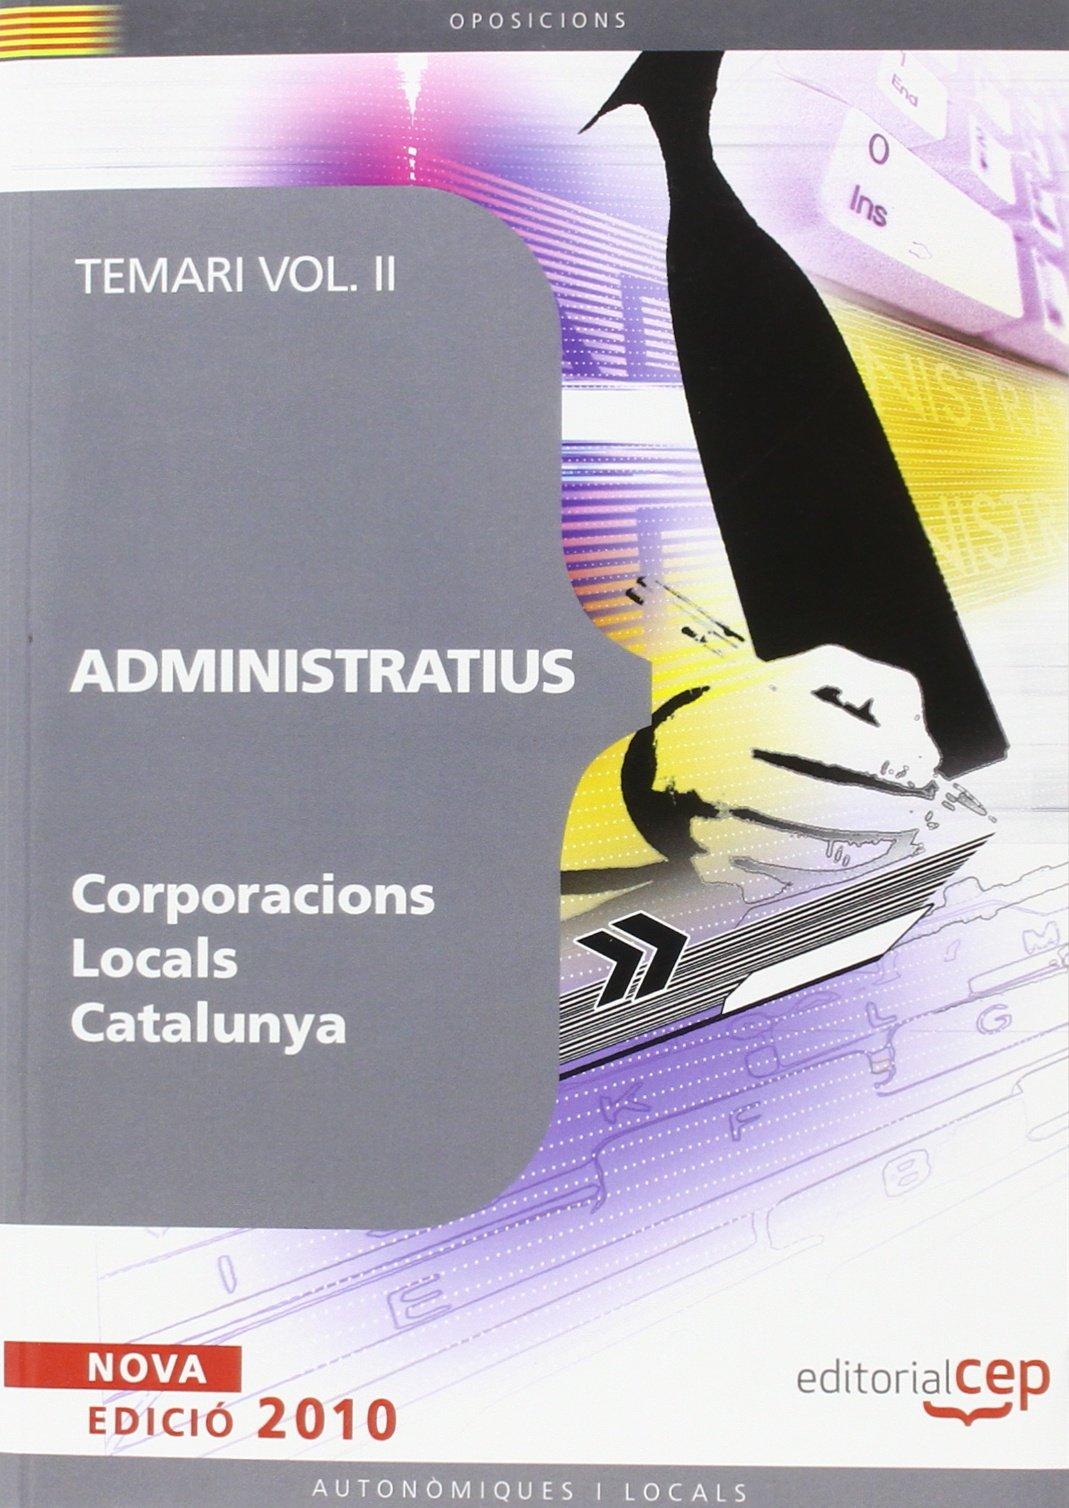 Administratius Corporacions Locals Catalunya. Temari Vol. II.: 2 (Colección 1247) Tapa blanda – 23 feb 2010 EDITORIAL CEP S.L. 8499375847 Legal system: general Primary sources of law